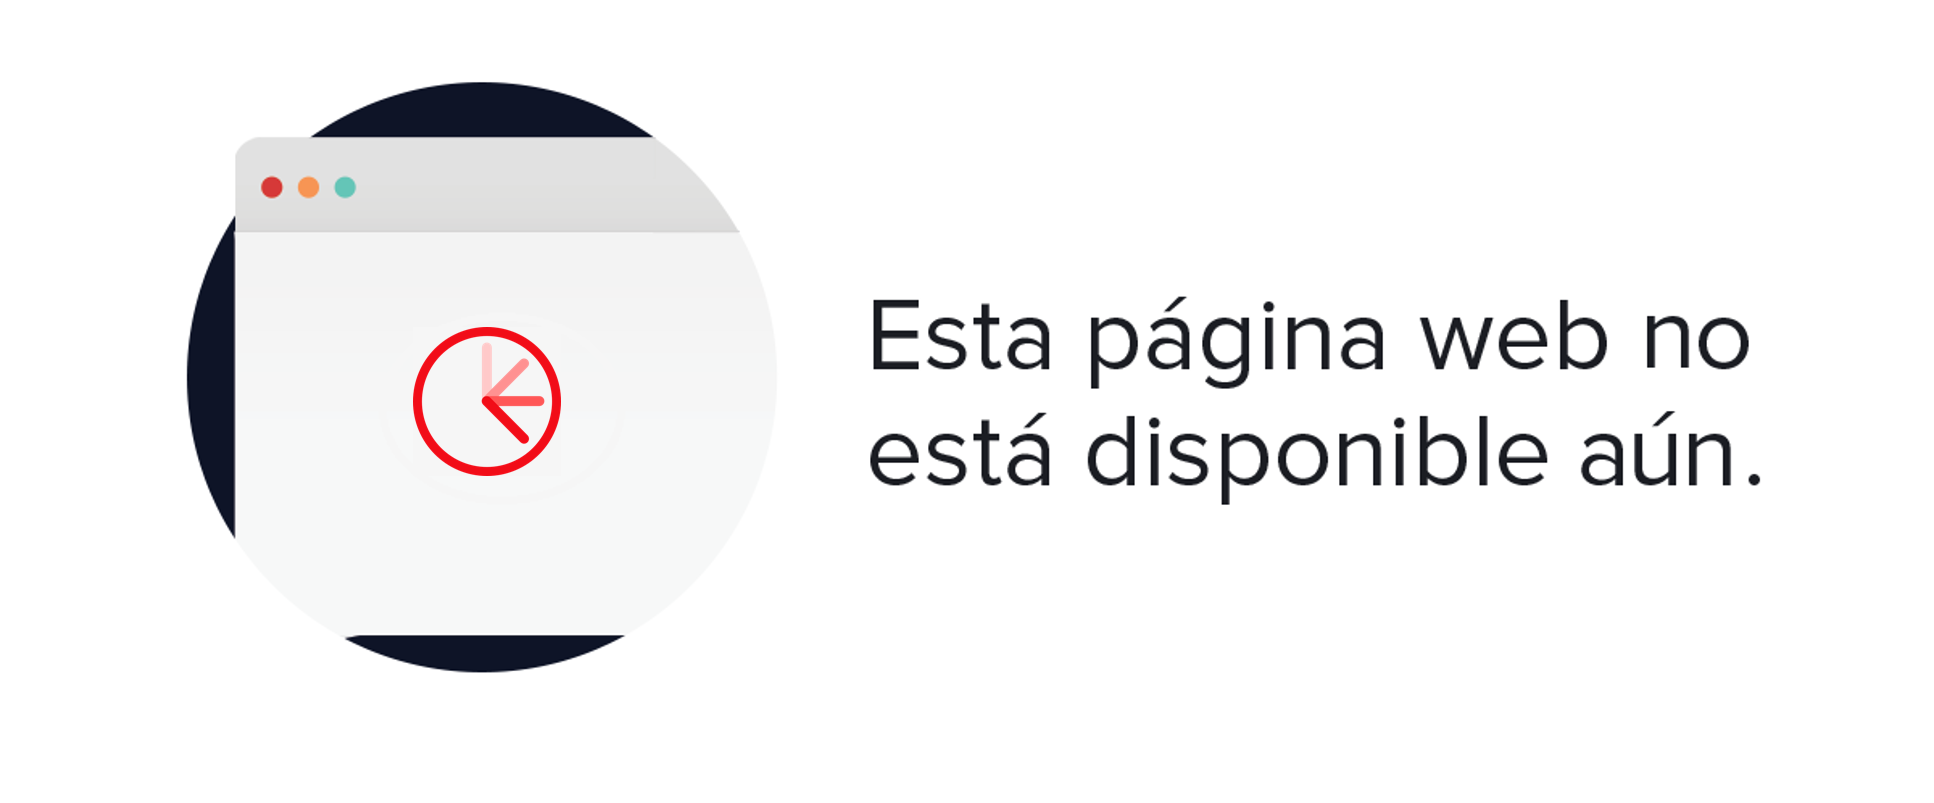 OXXO - Pantalón de mujer OXXO pitillo y tobillero Azul 8681613250796 - DEYZXPI